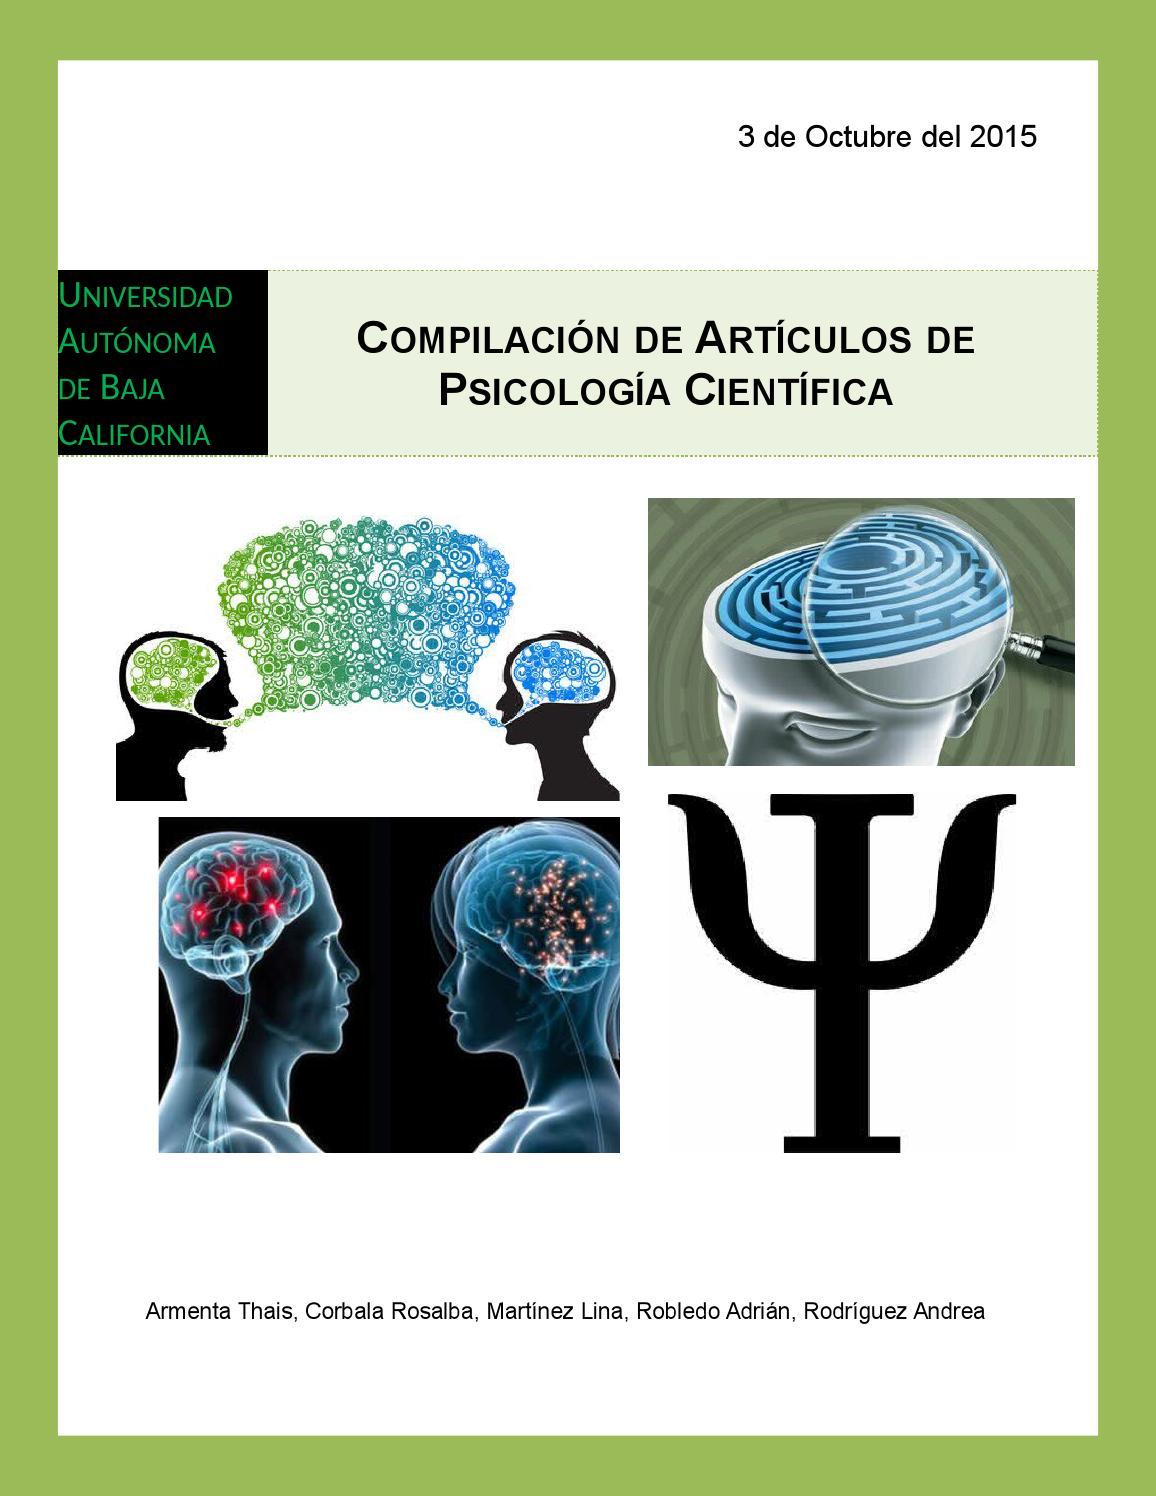 Articulos psicologia cientifica by thais - issuu